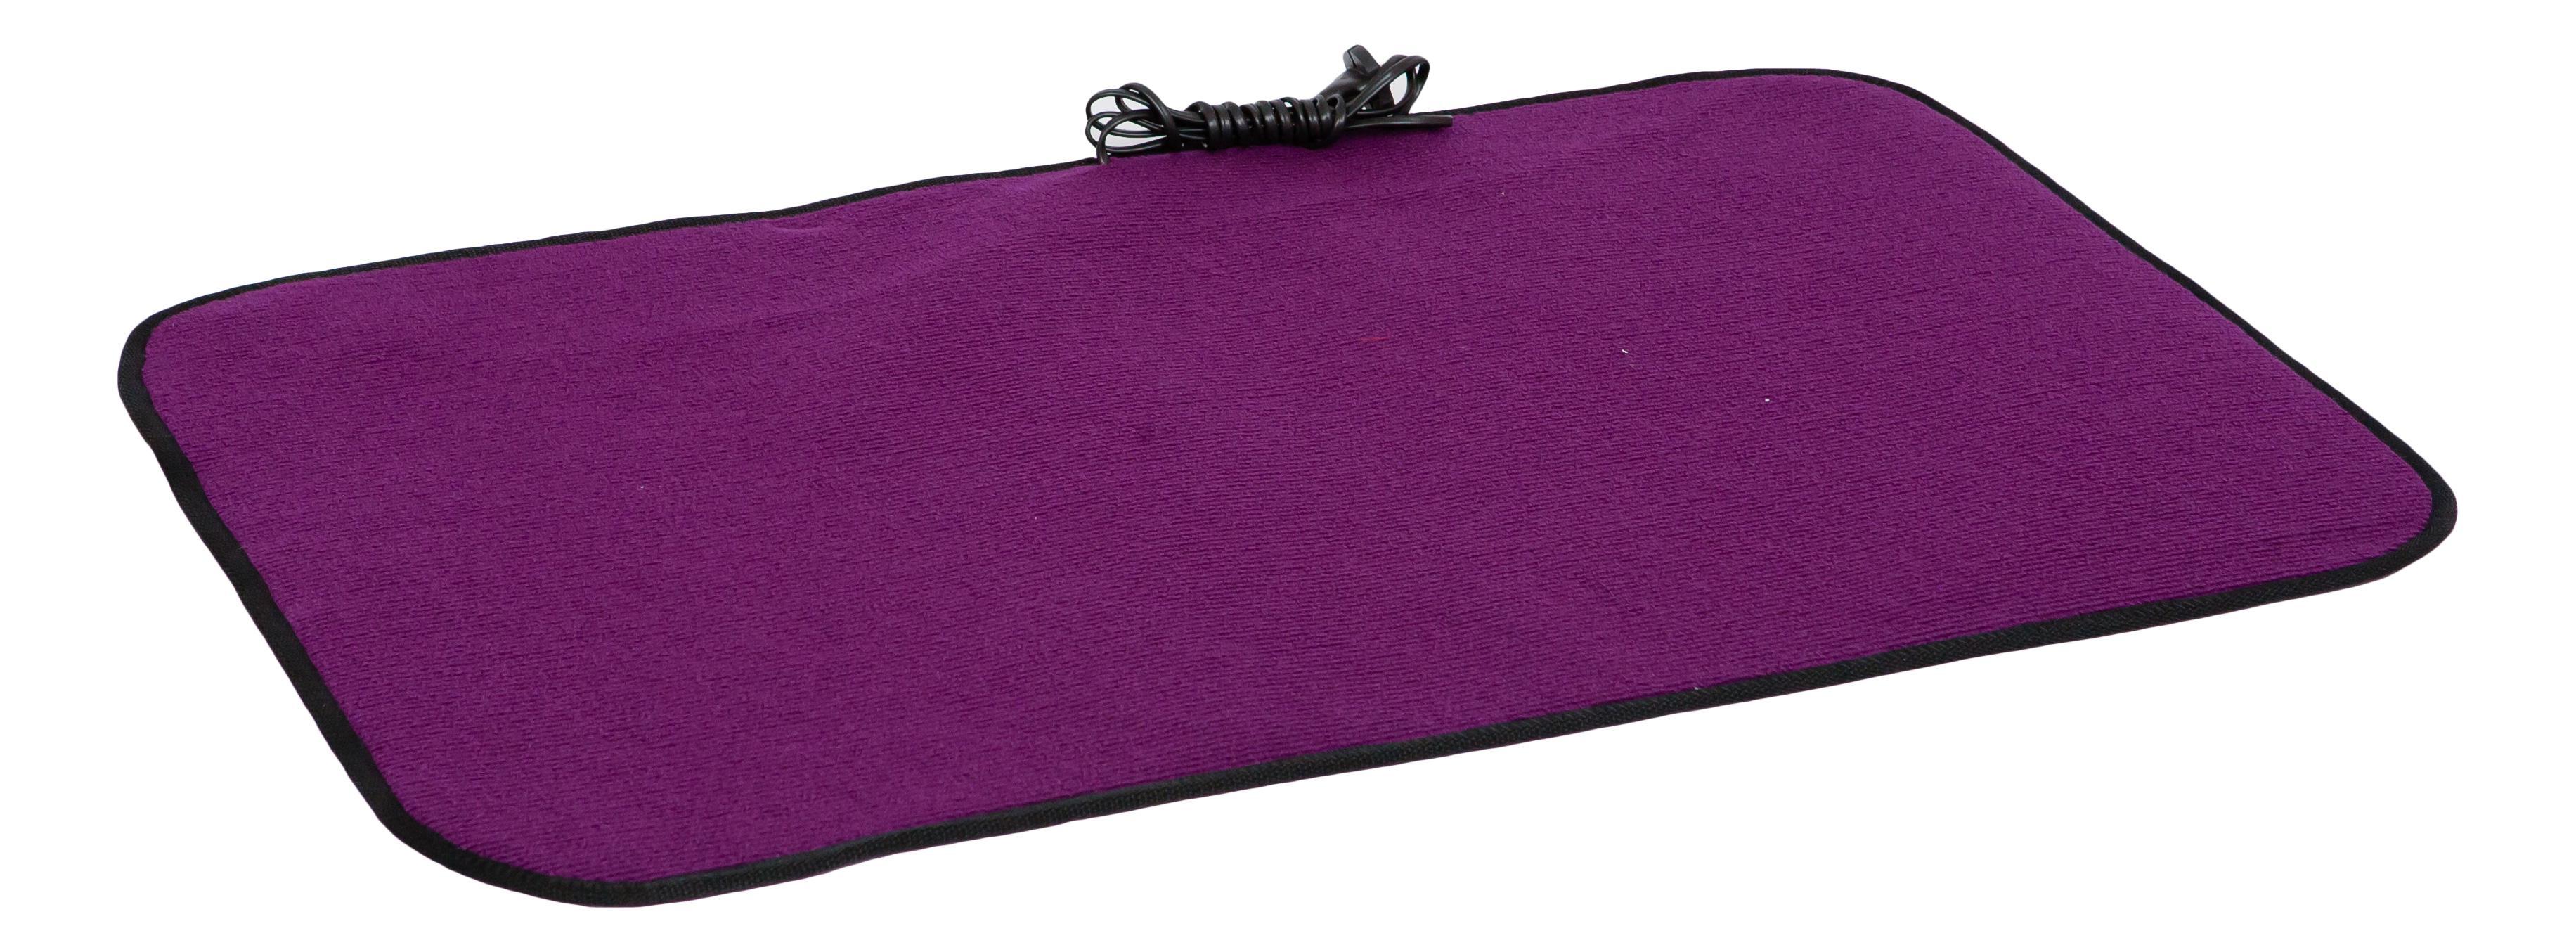 Коврик Stem energy КТ3 фиолетовый 86х56 КОВ052 весы напольные scarlett sc bsd33m951